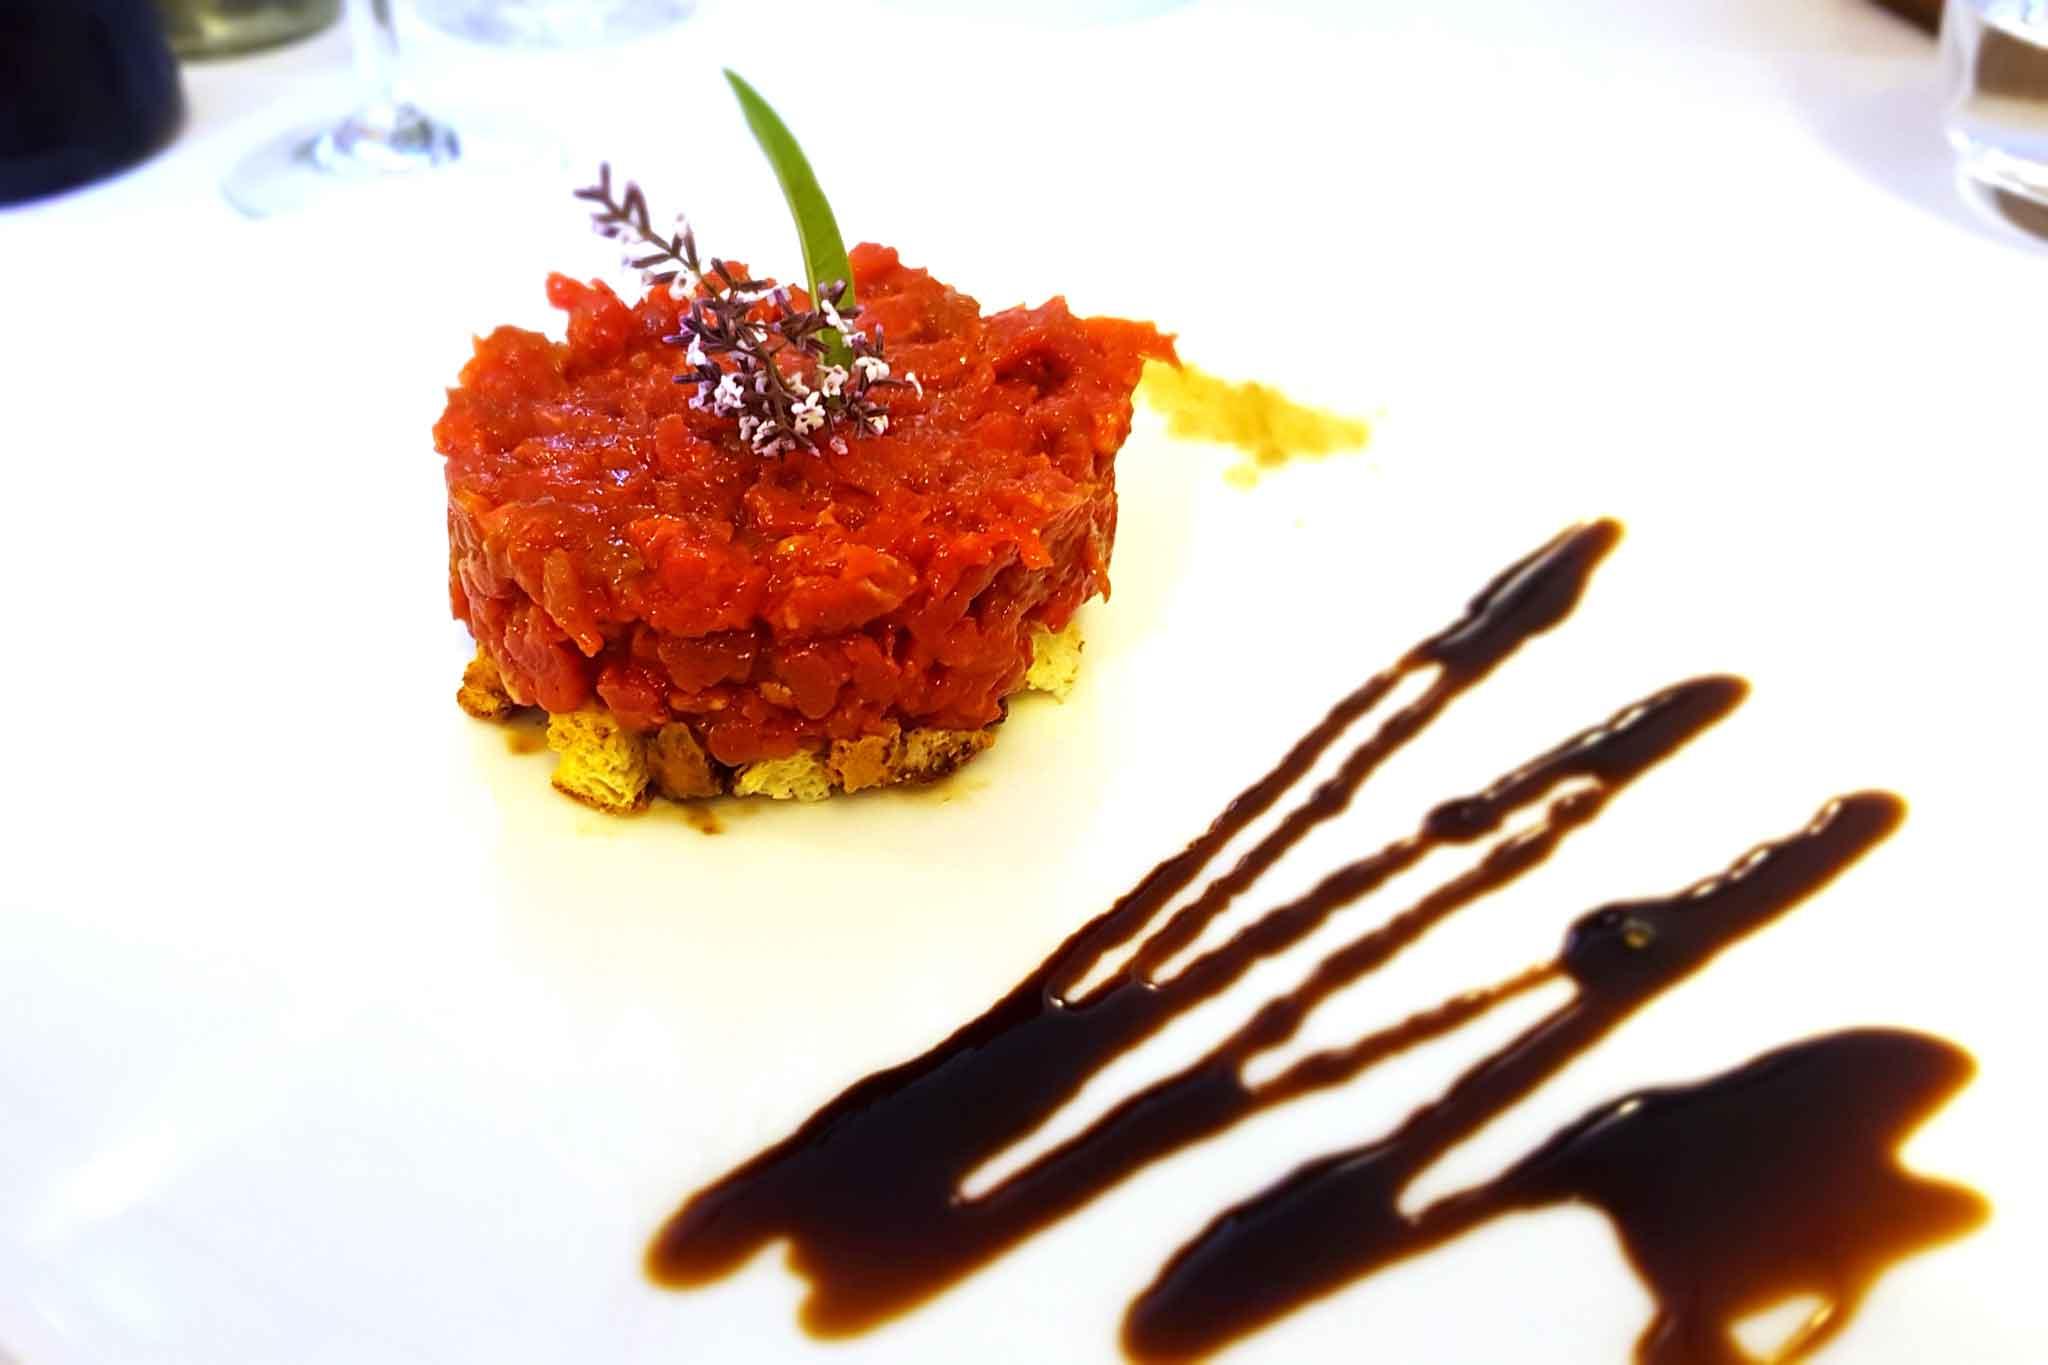 ristorante-badesse-casalgrande-tartare-mora-romagnola